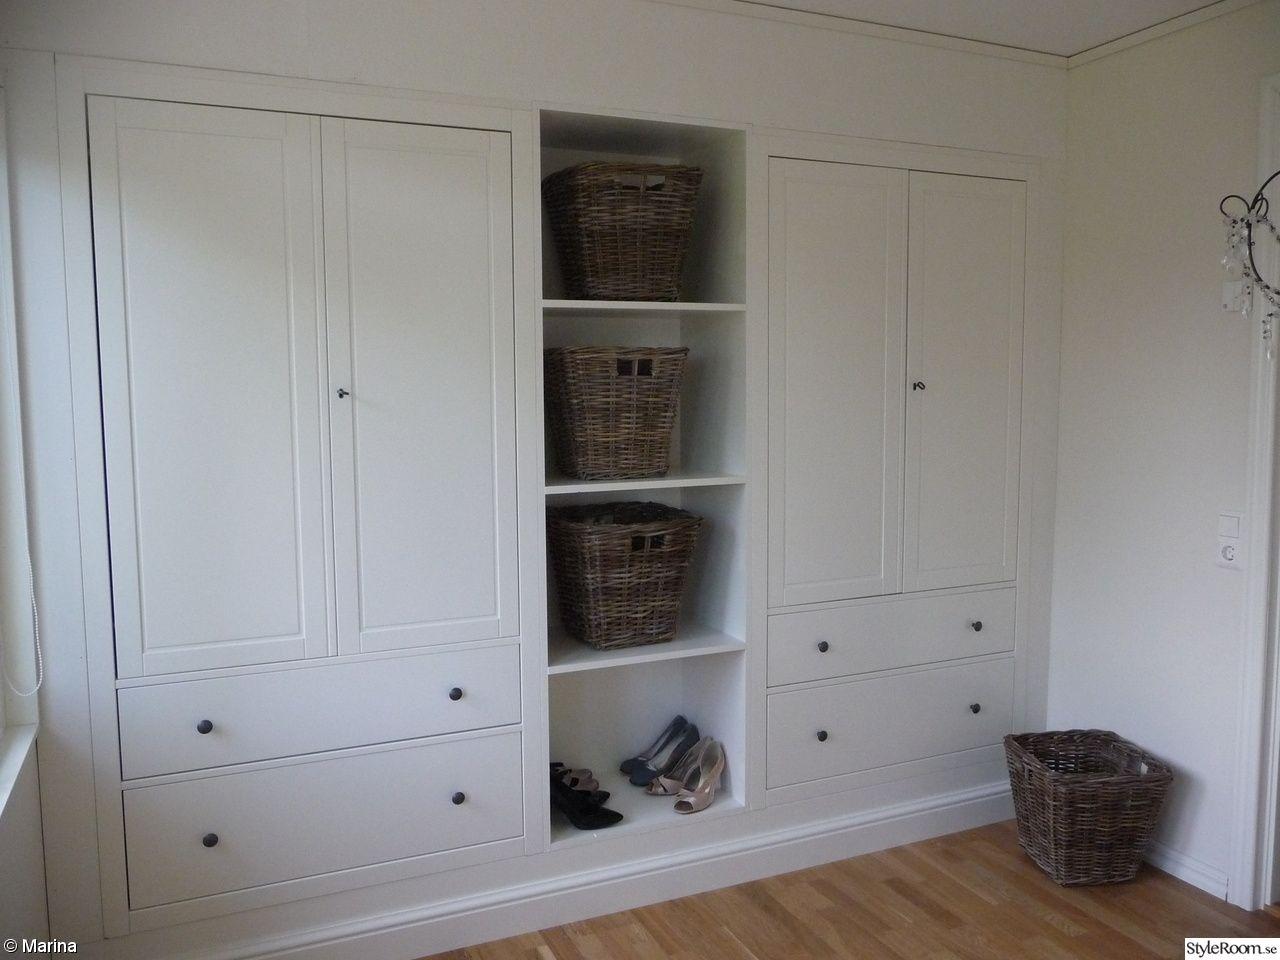 platsbyggd garderob fr n ikea hall pinterest sovrum garderob och ikea. Black Bedroom Furniture Sets. Home Design Ideas